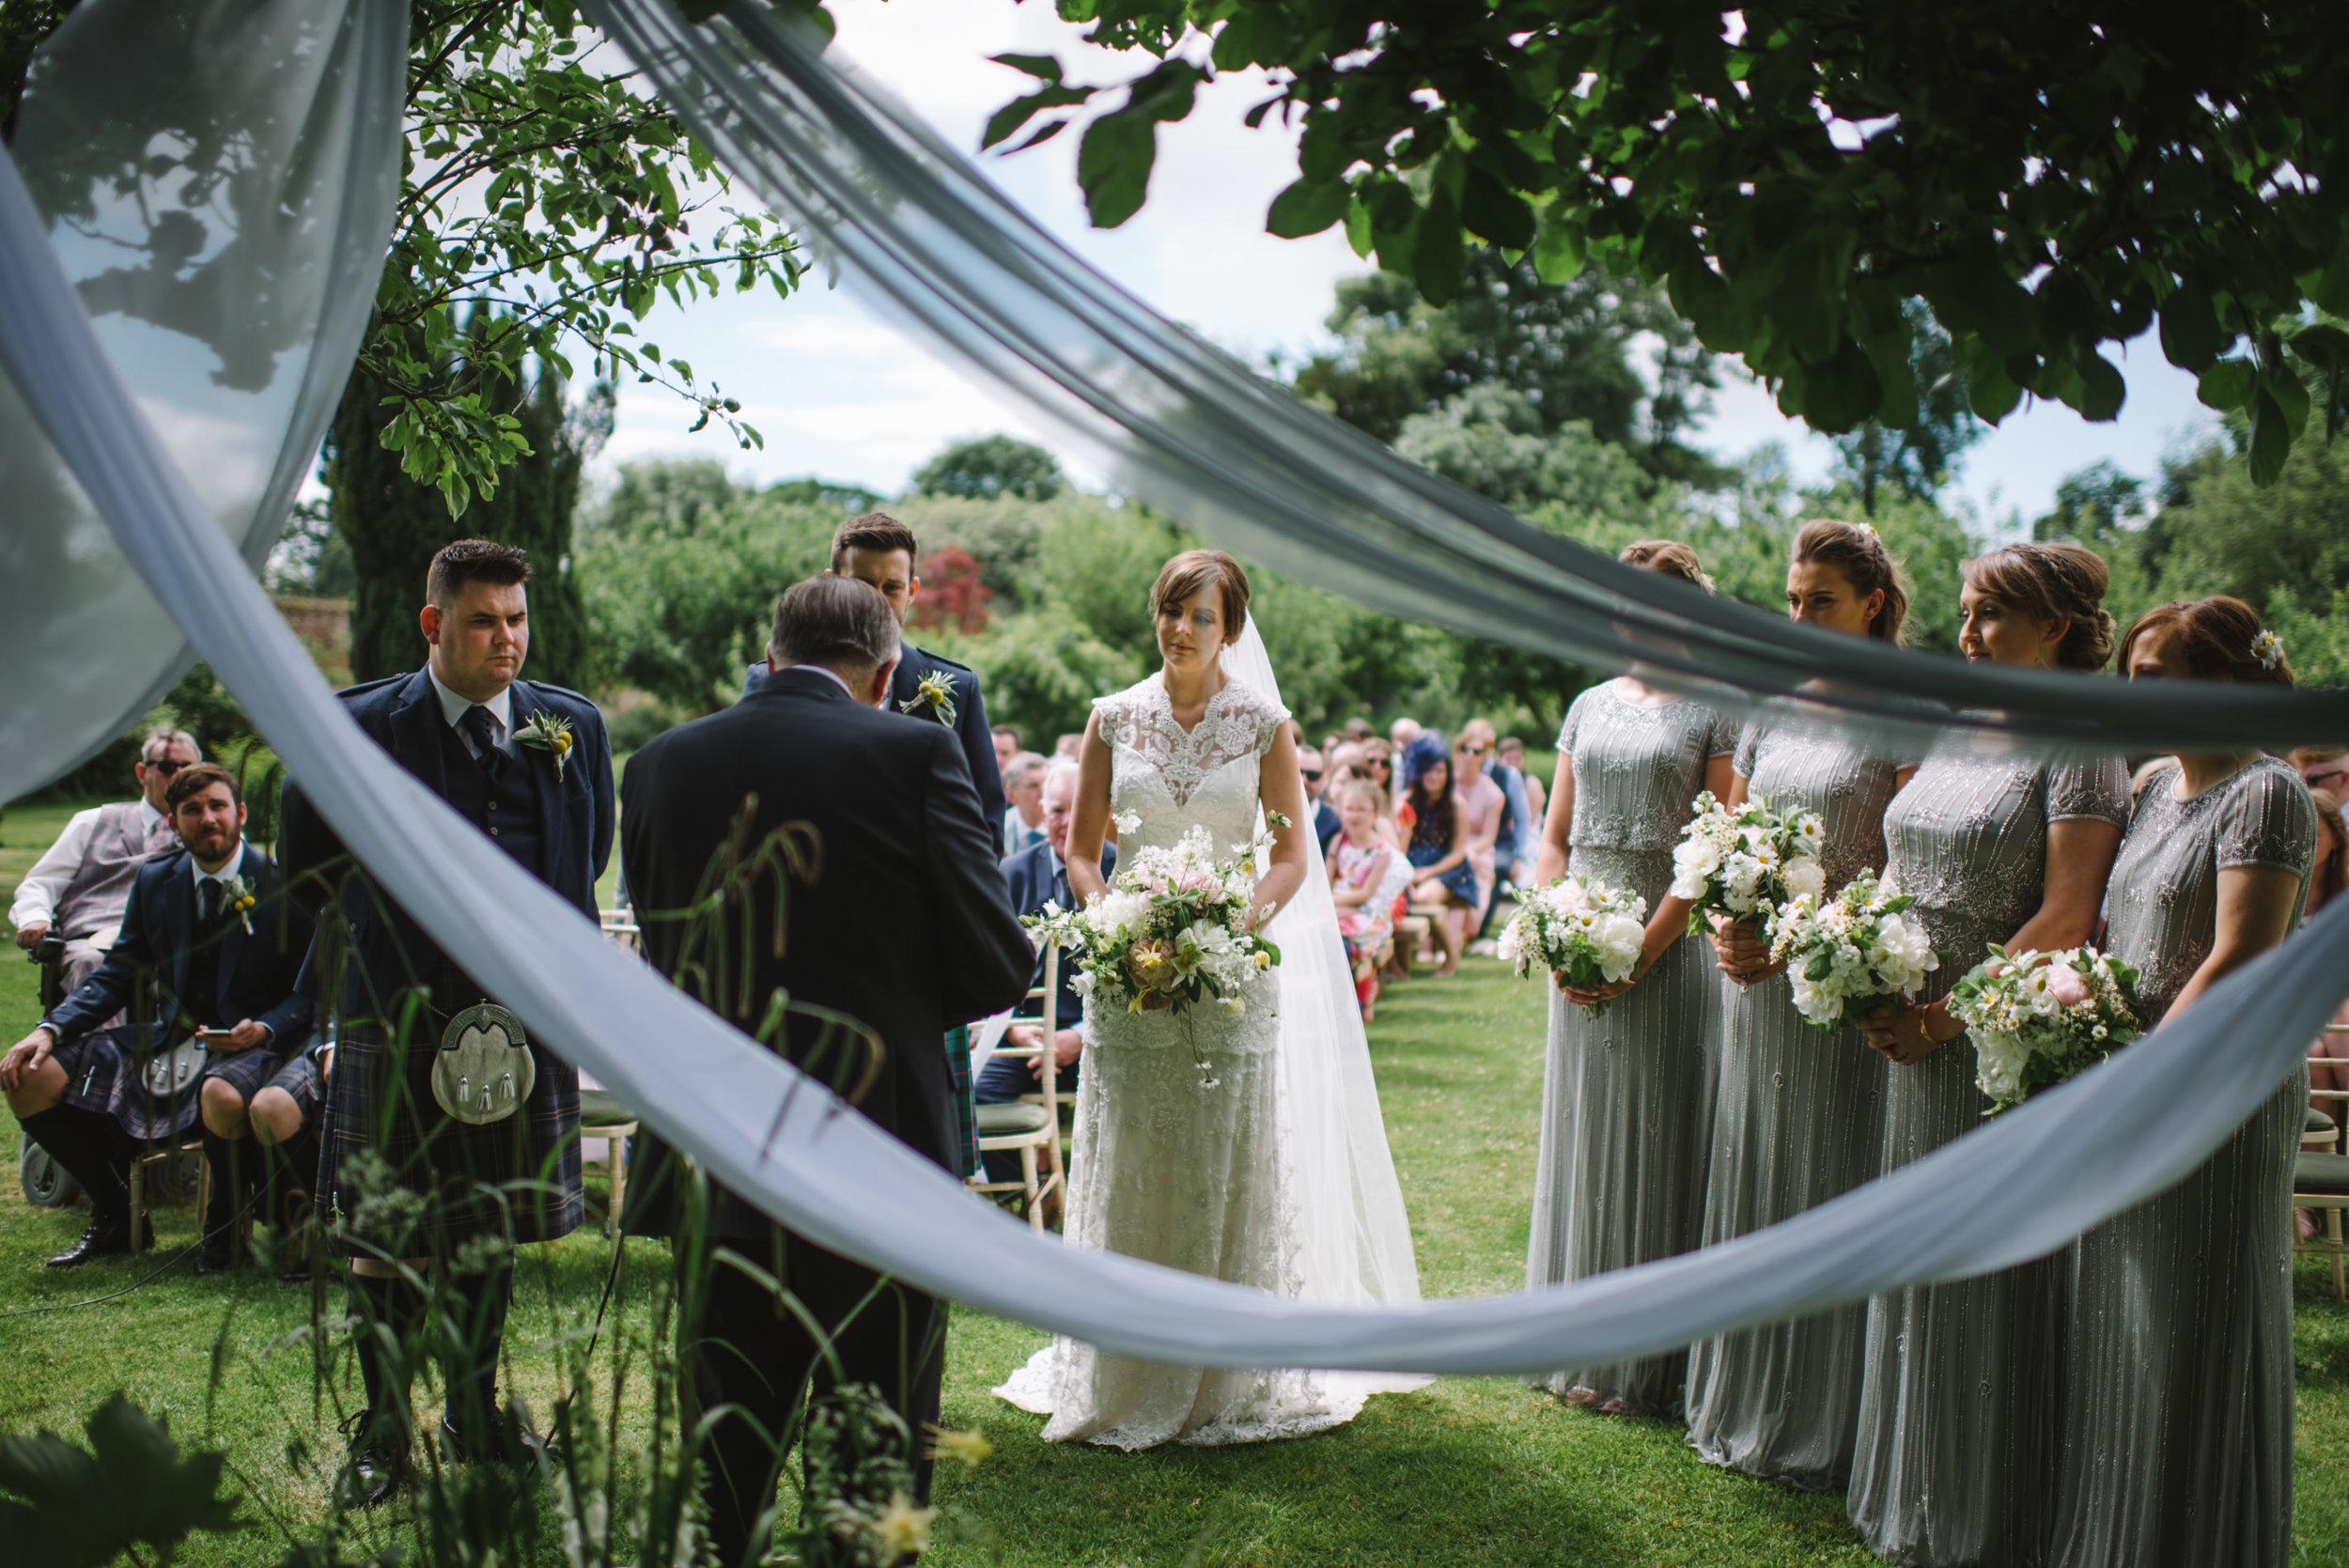 0230-LISA-DEVINE-PHOTOGRAPHY-ALTERNATIVE-WEDDING-PHOTOGRAPHY-SCOTLAND-DESTINATION-WEDDINGS-GLASGOW-WEDDINGS-COOL-WEDDINGS-STYLISH-WEDDINGS.JPG